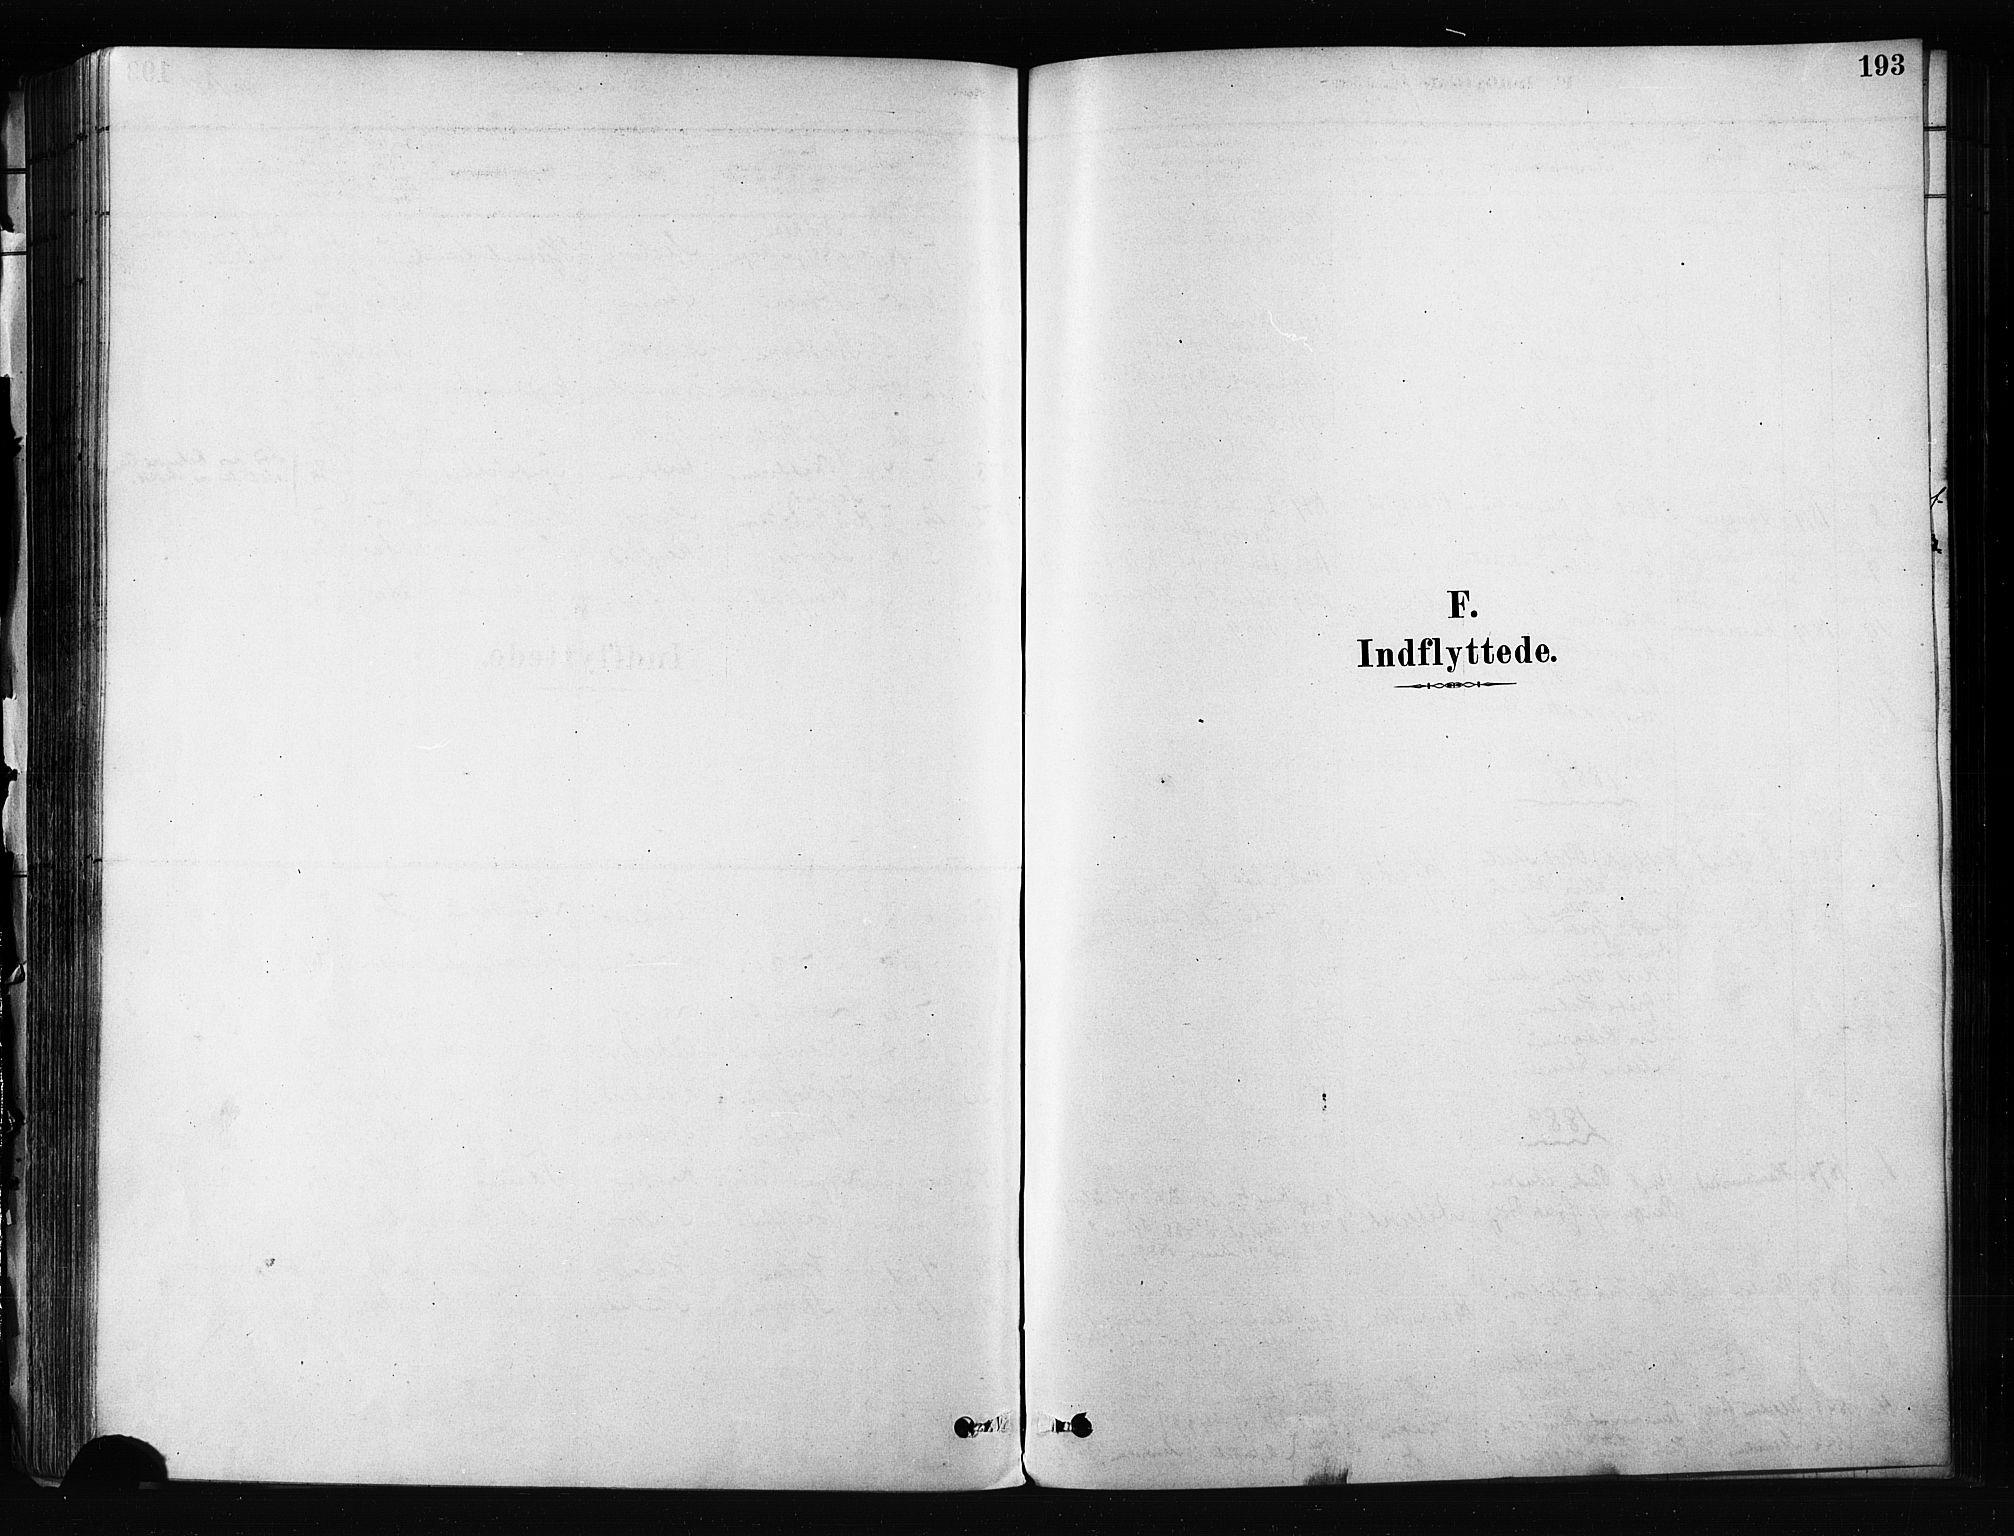 SATØ, Skjervøy sokneprestkontor, H/Ha/Haa/L0012kirke: Ministerialbok nr. 12, 1878-1891, s. 193